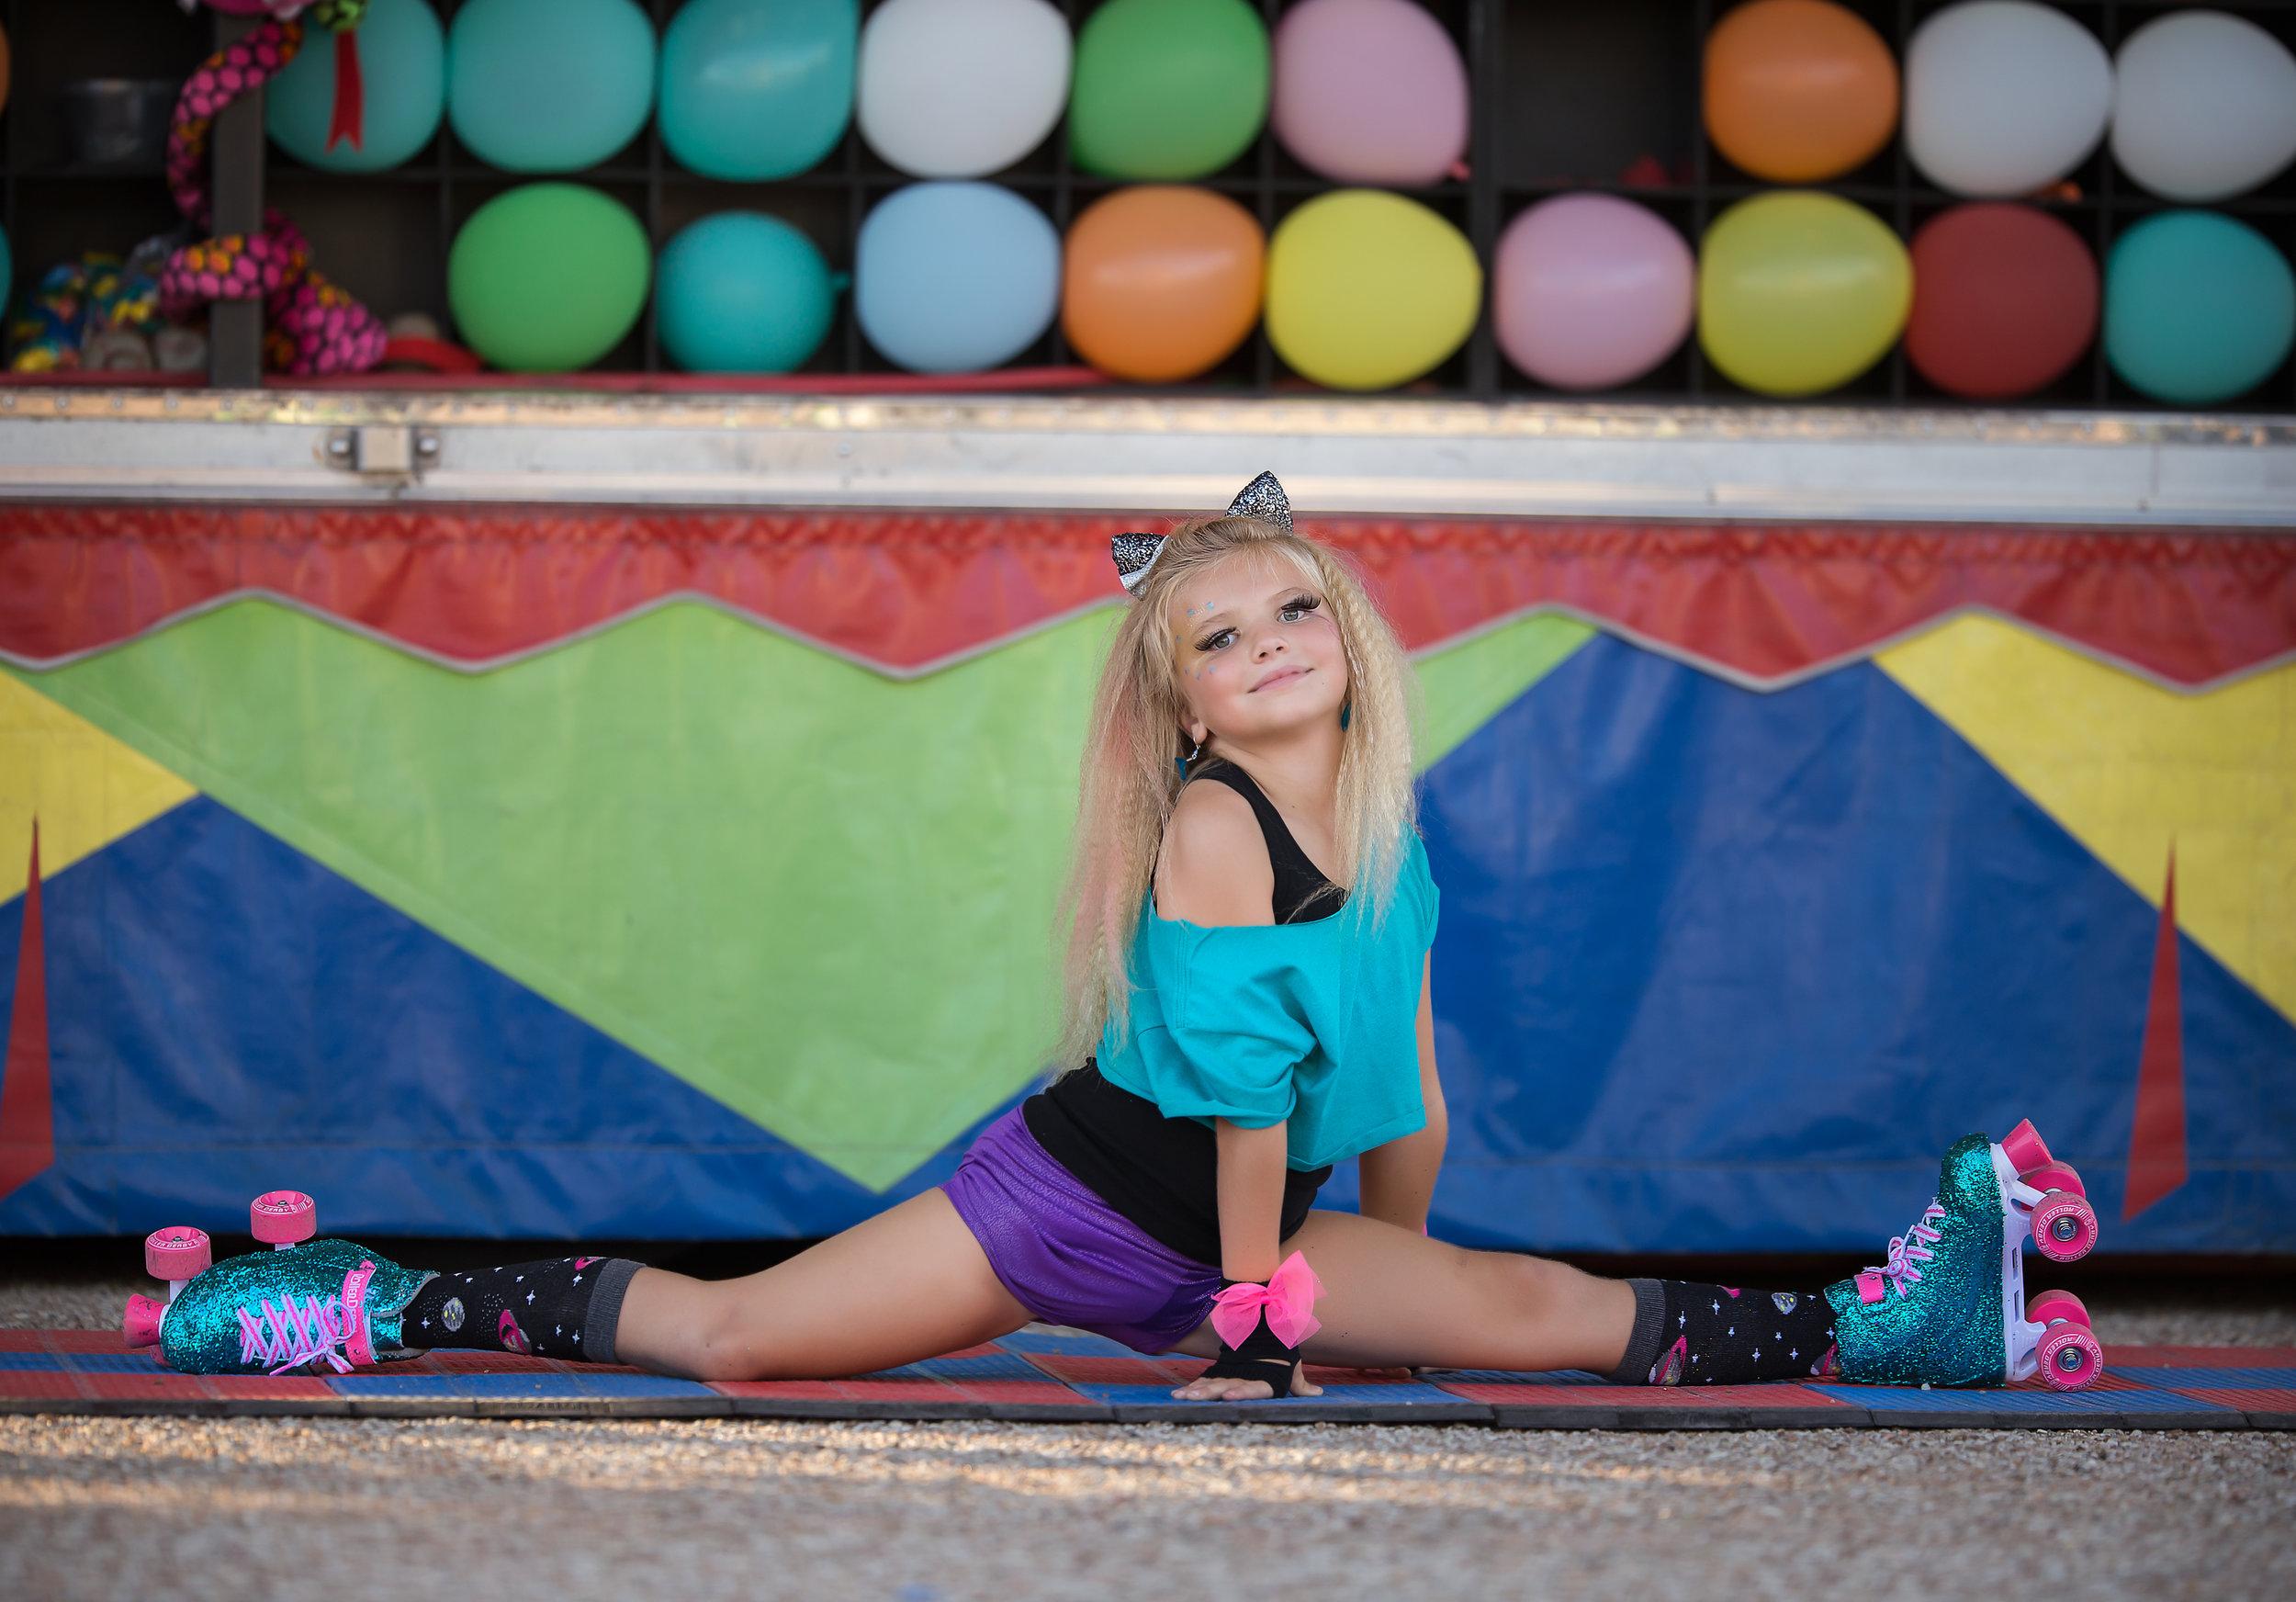 Houston Child Fashion Photographer   Maribella Portrats, LLC   www.maribellaportraits.rocks